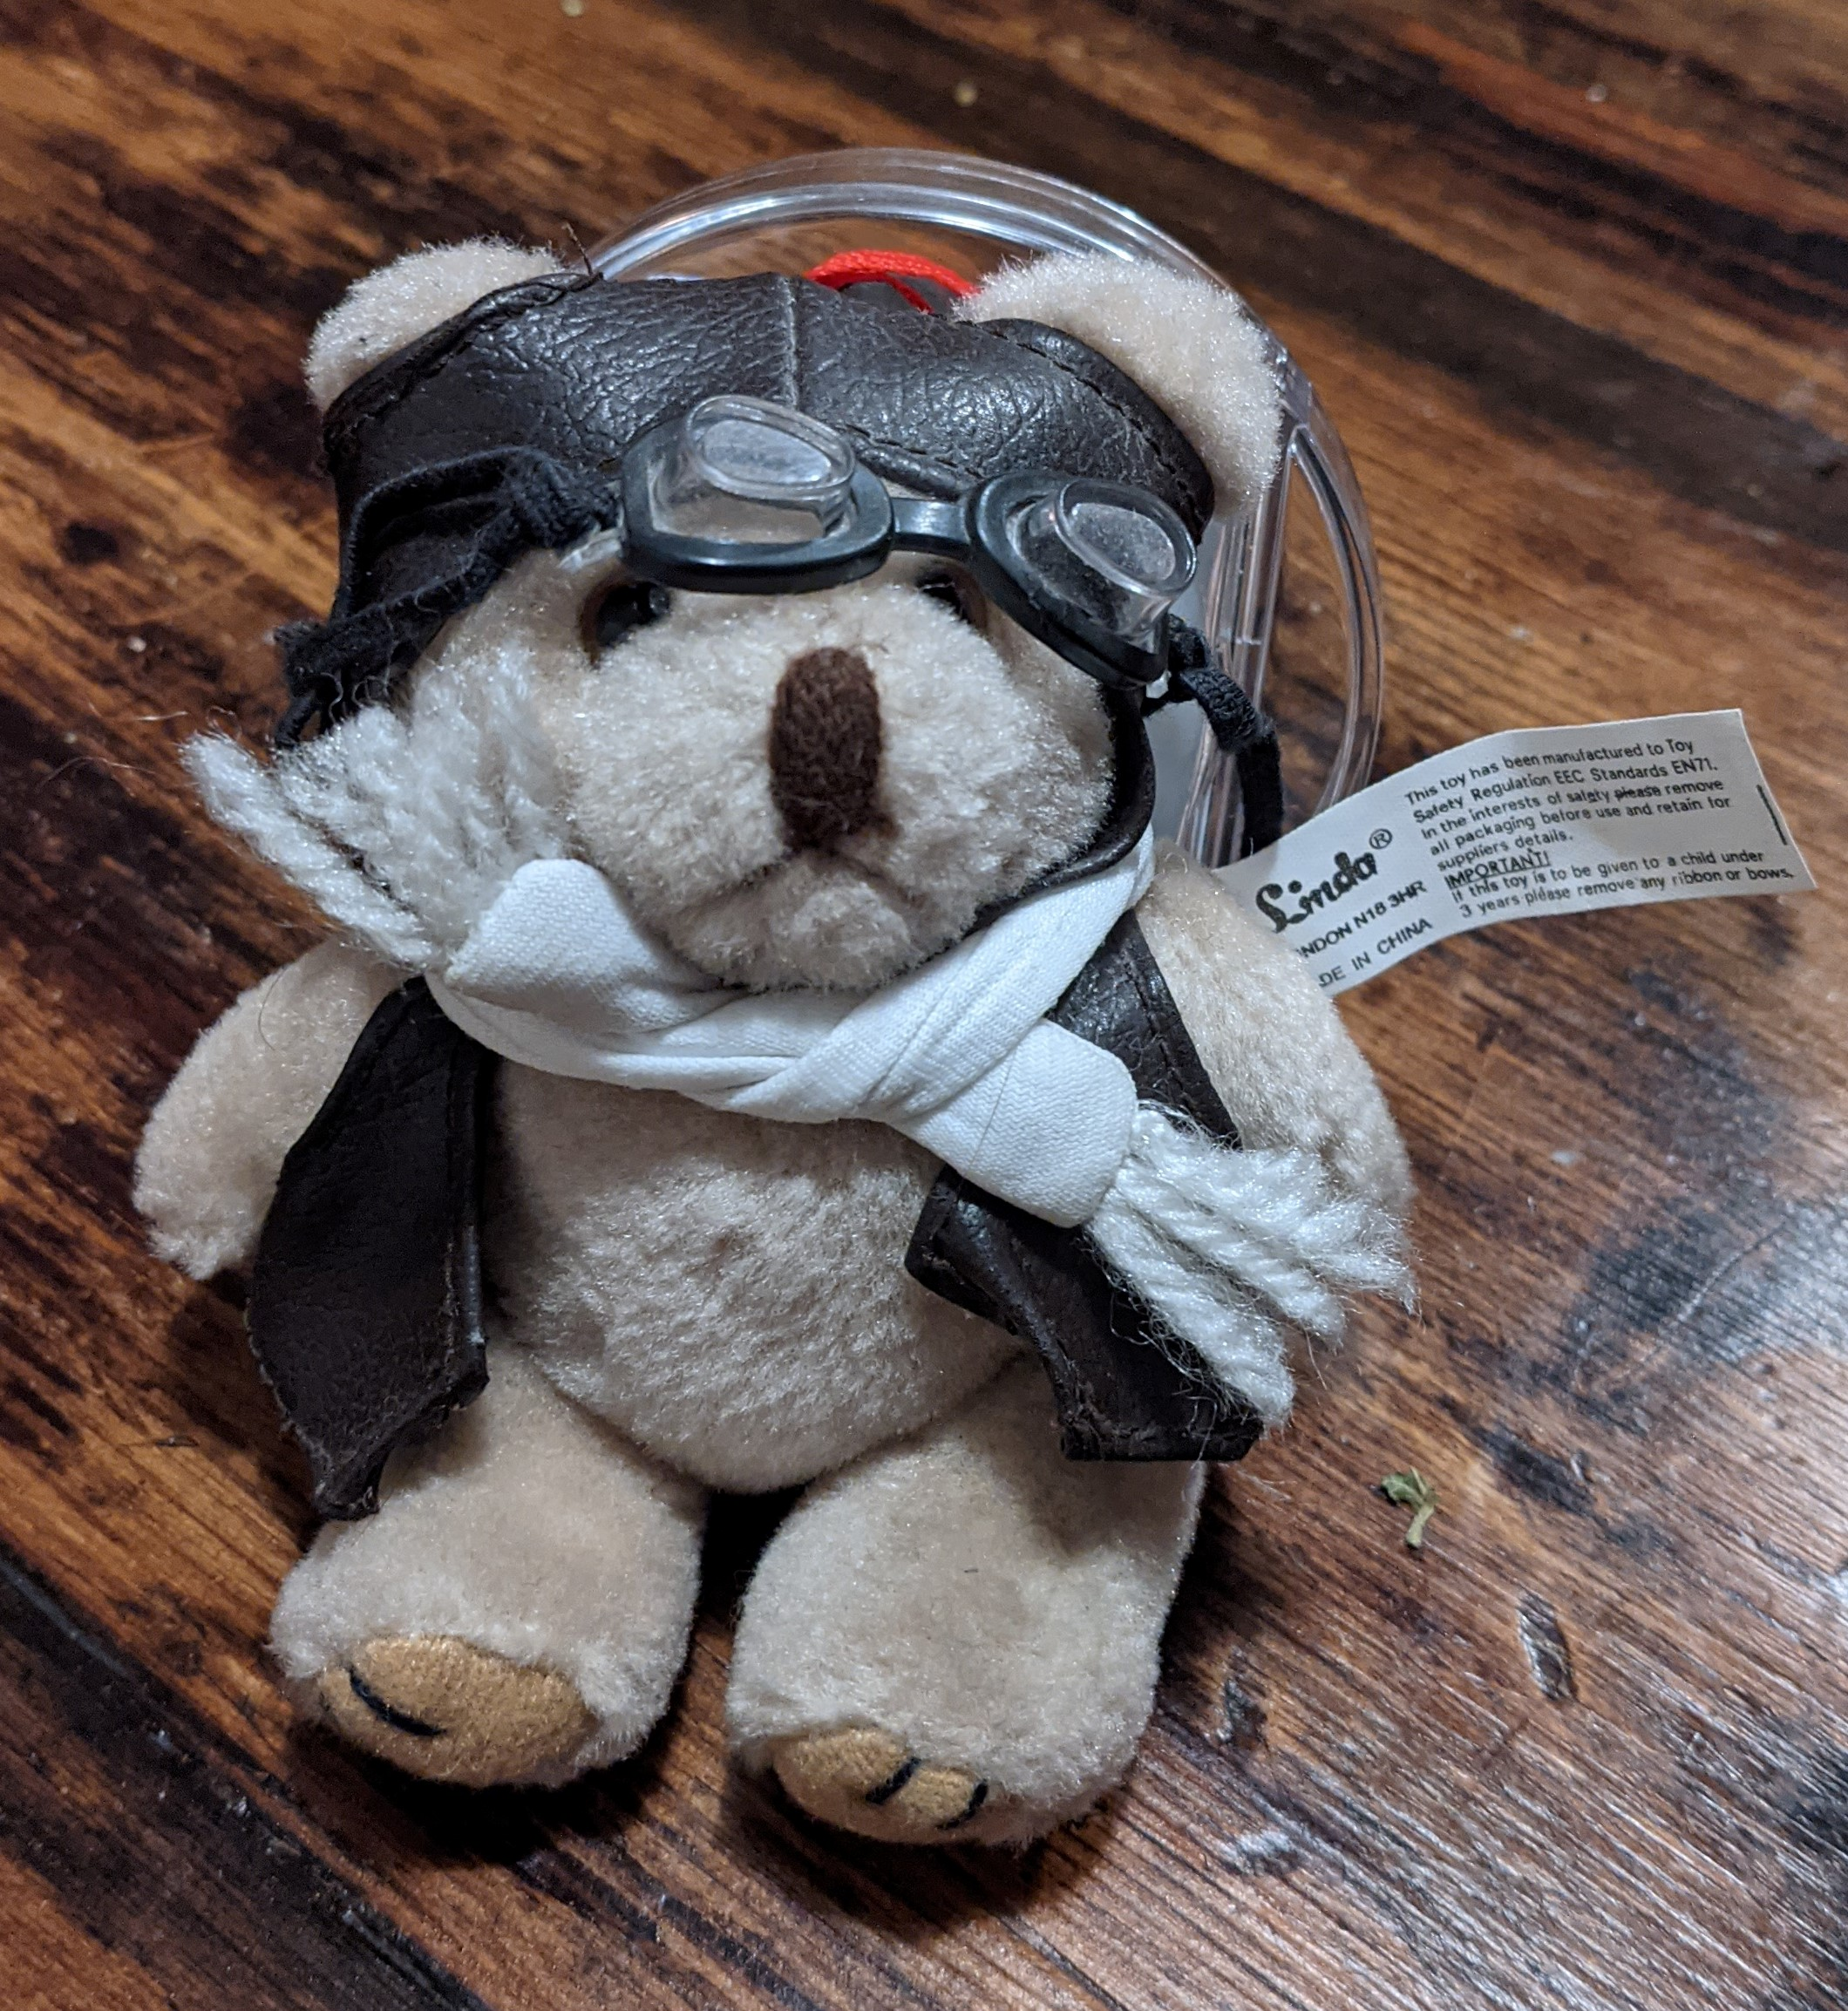 Tidy Teddy